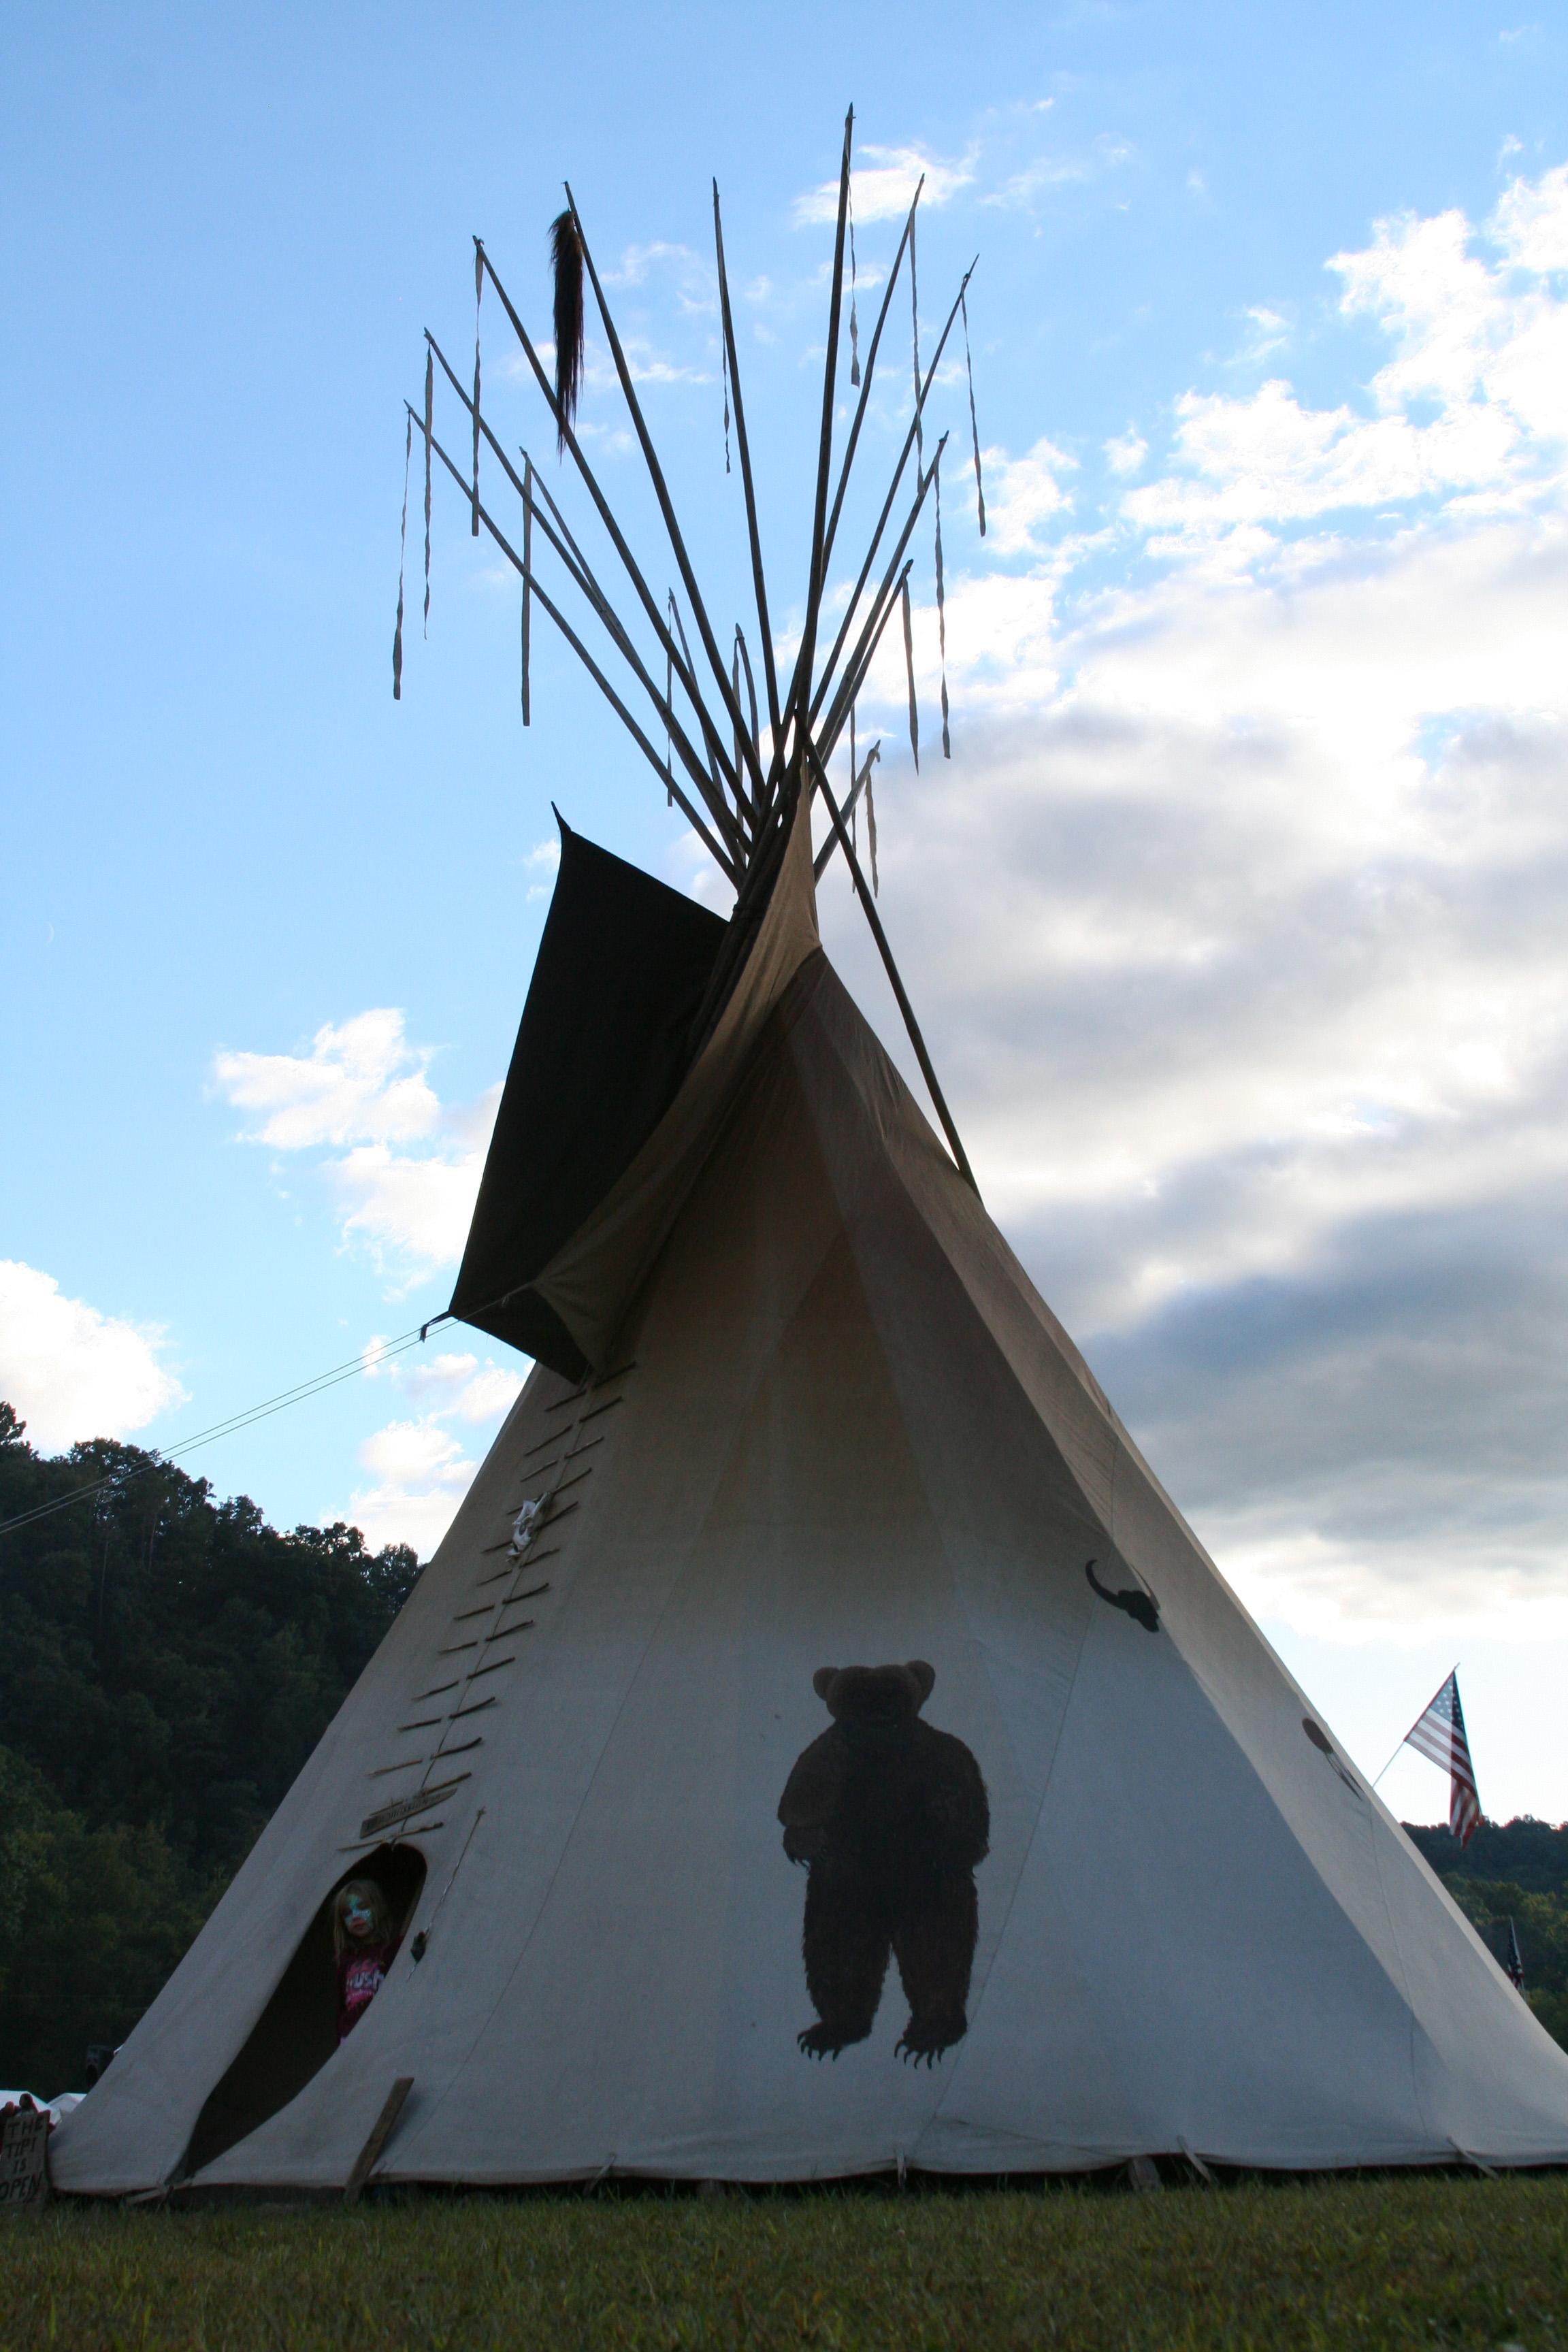 Plains native Teepee